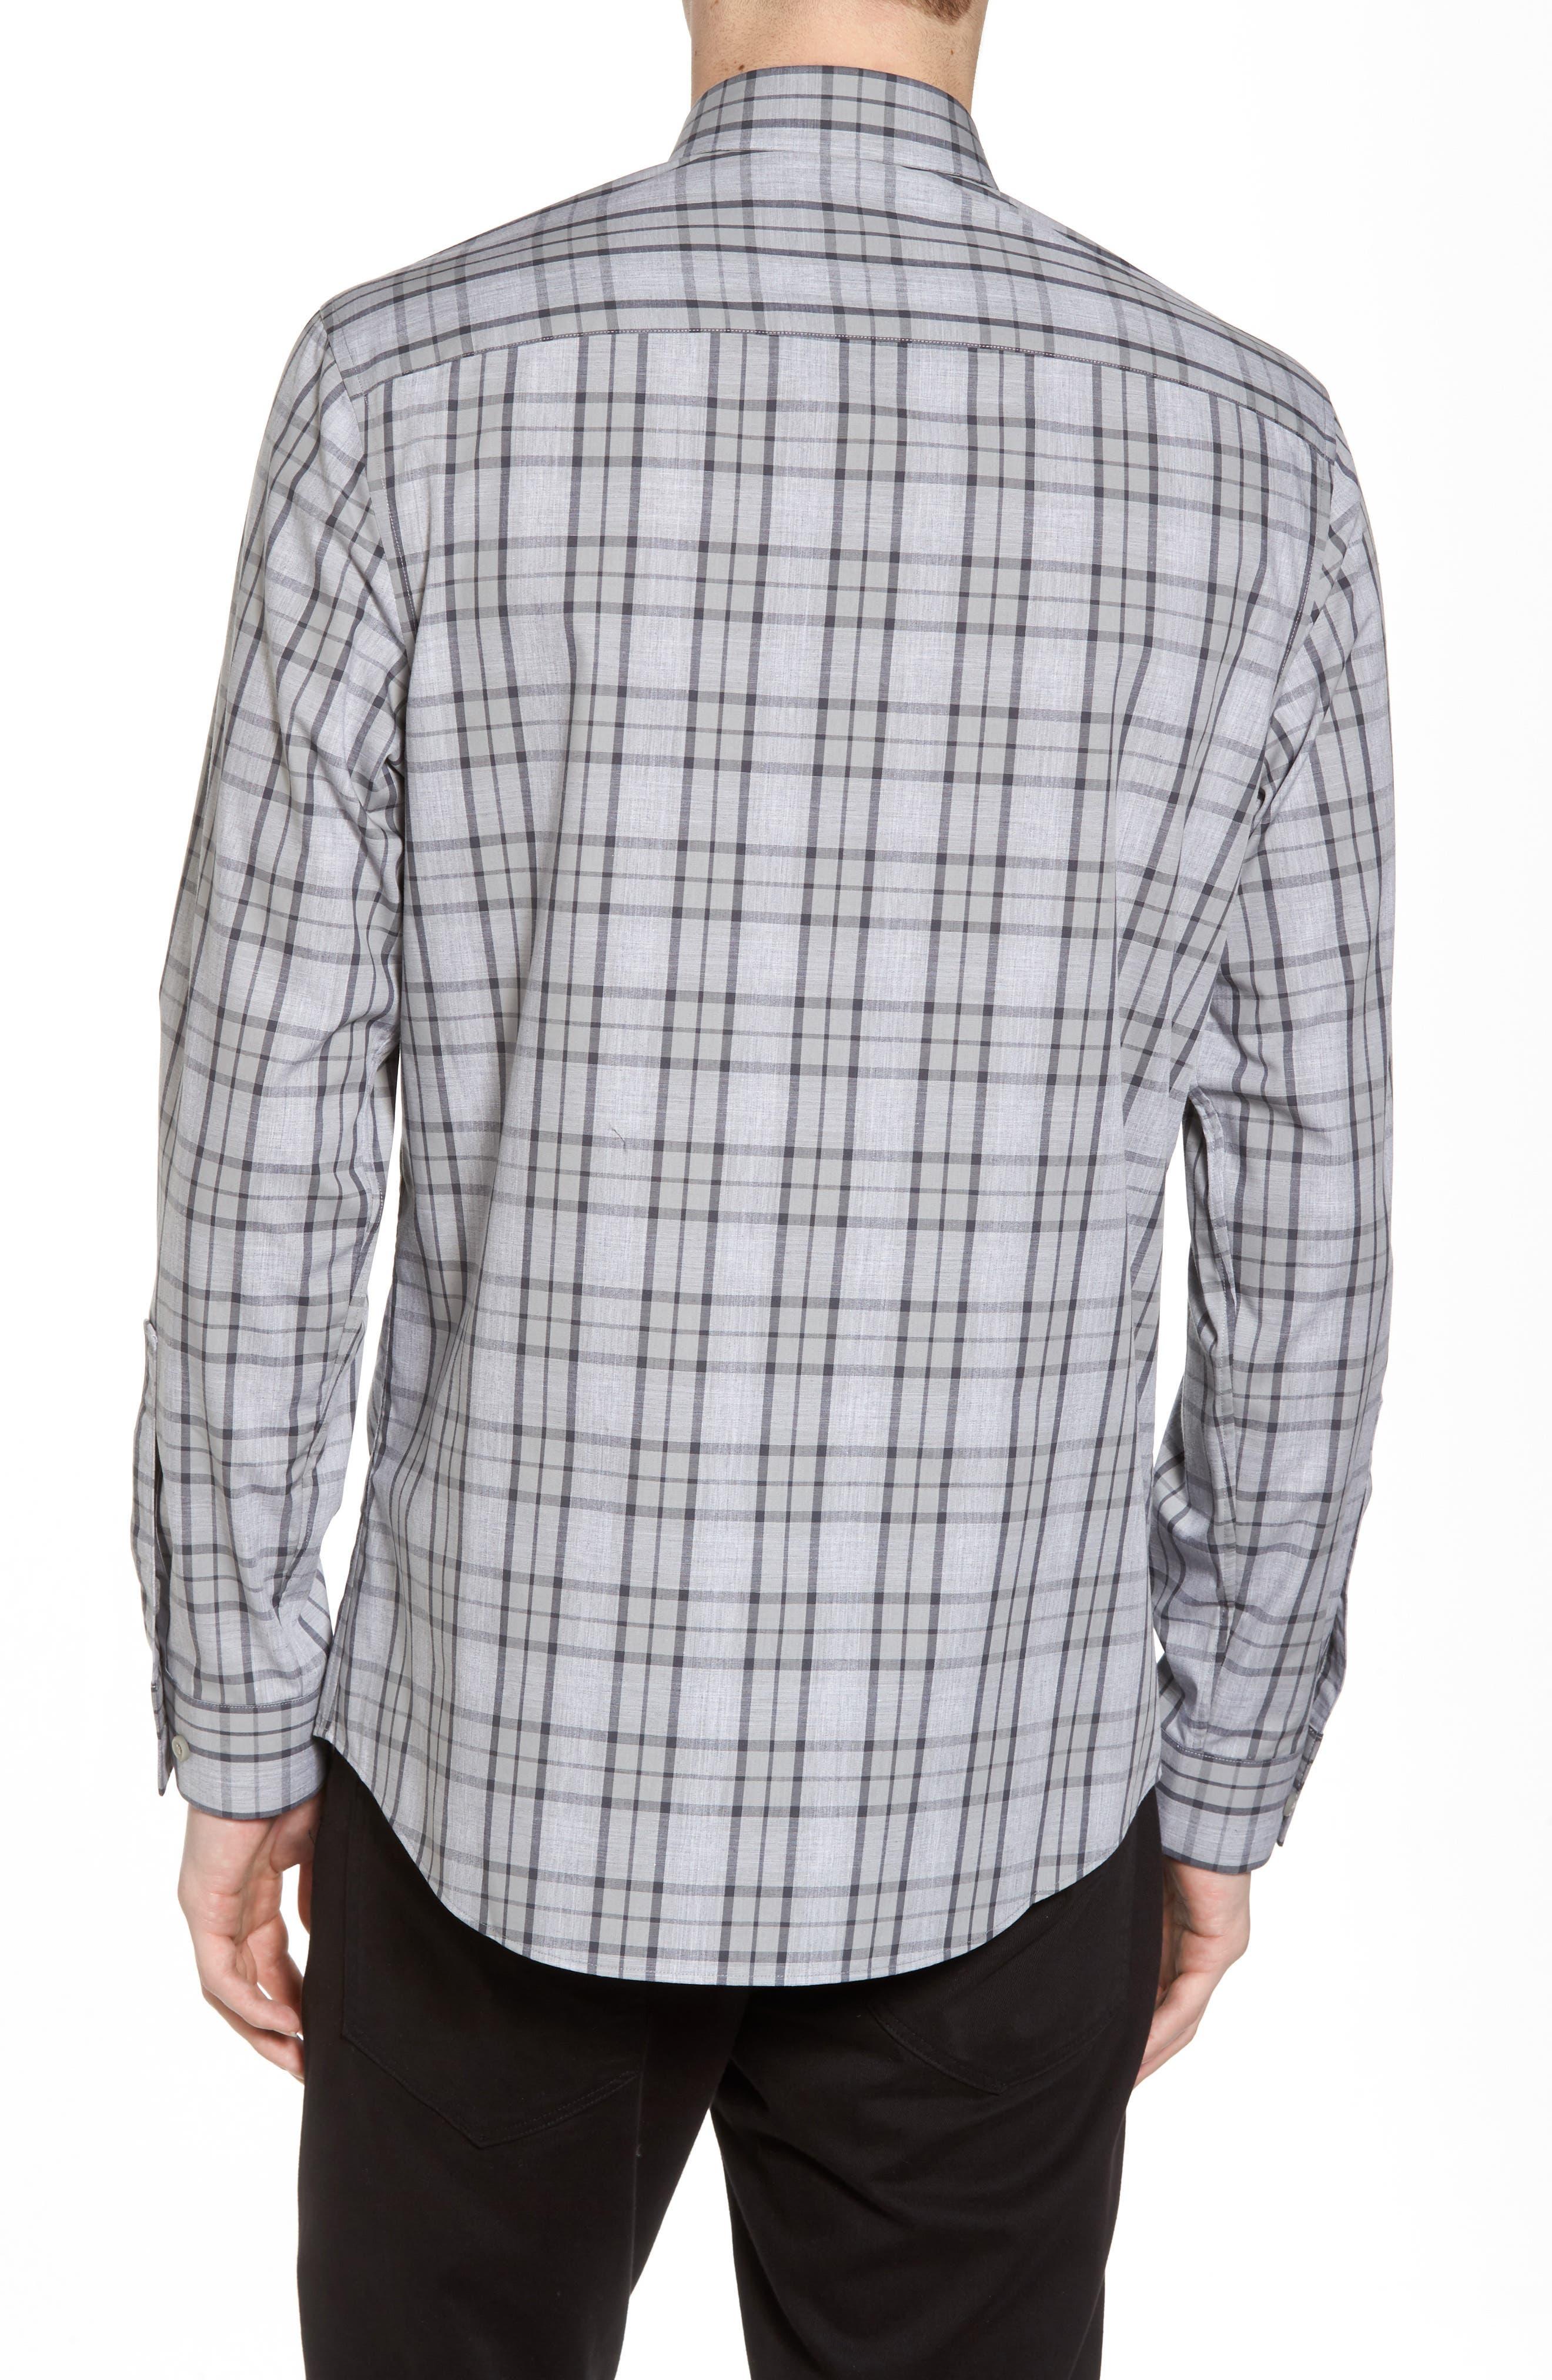 Trim Fit Plaid Sport Shirt,                             Alternate thumbnail 2, color,                             Grey Micro Heather Plaid